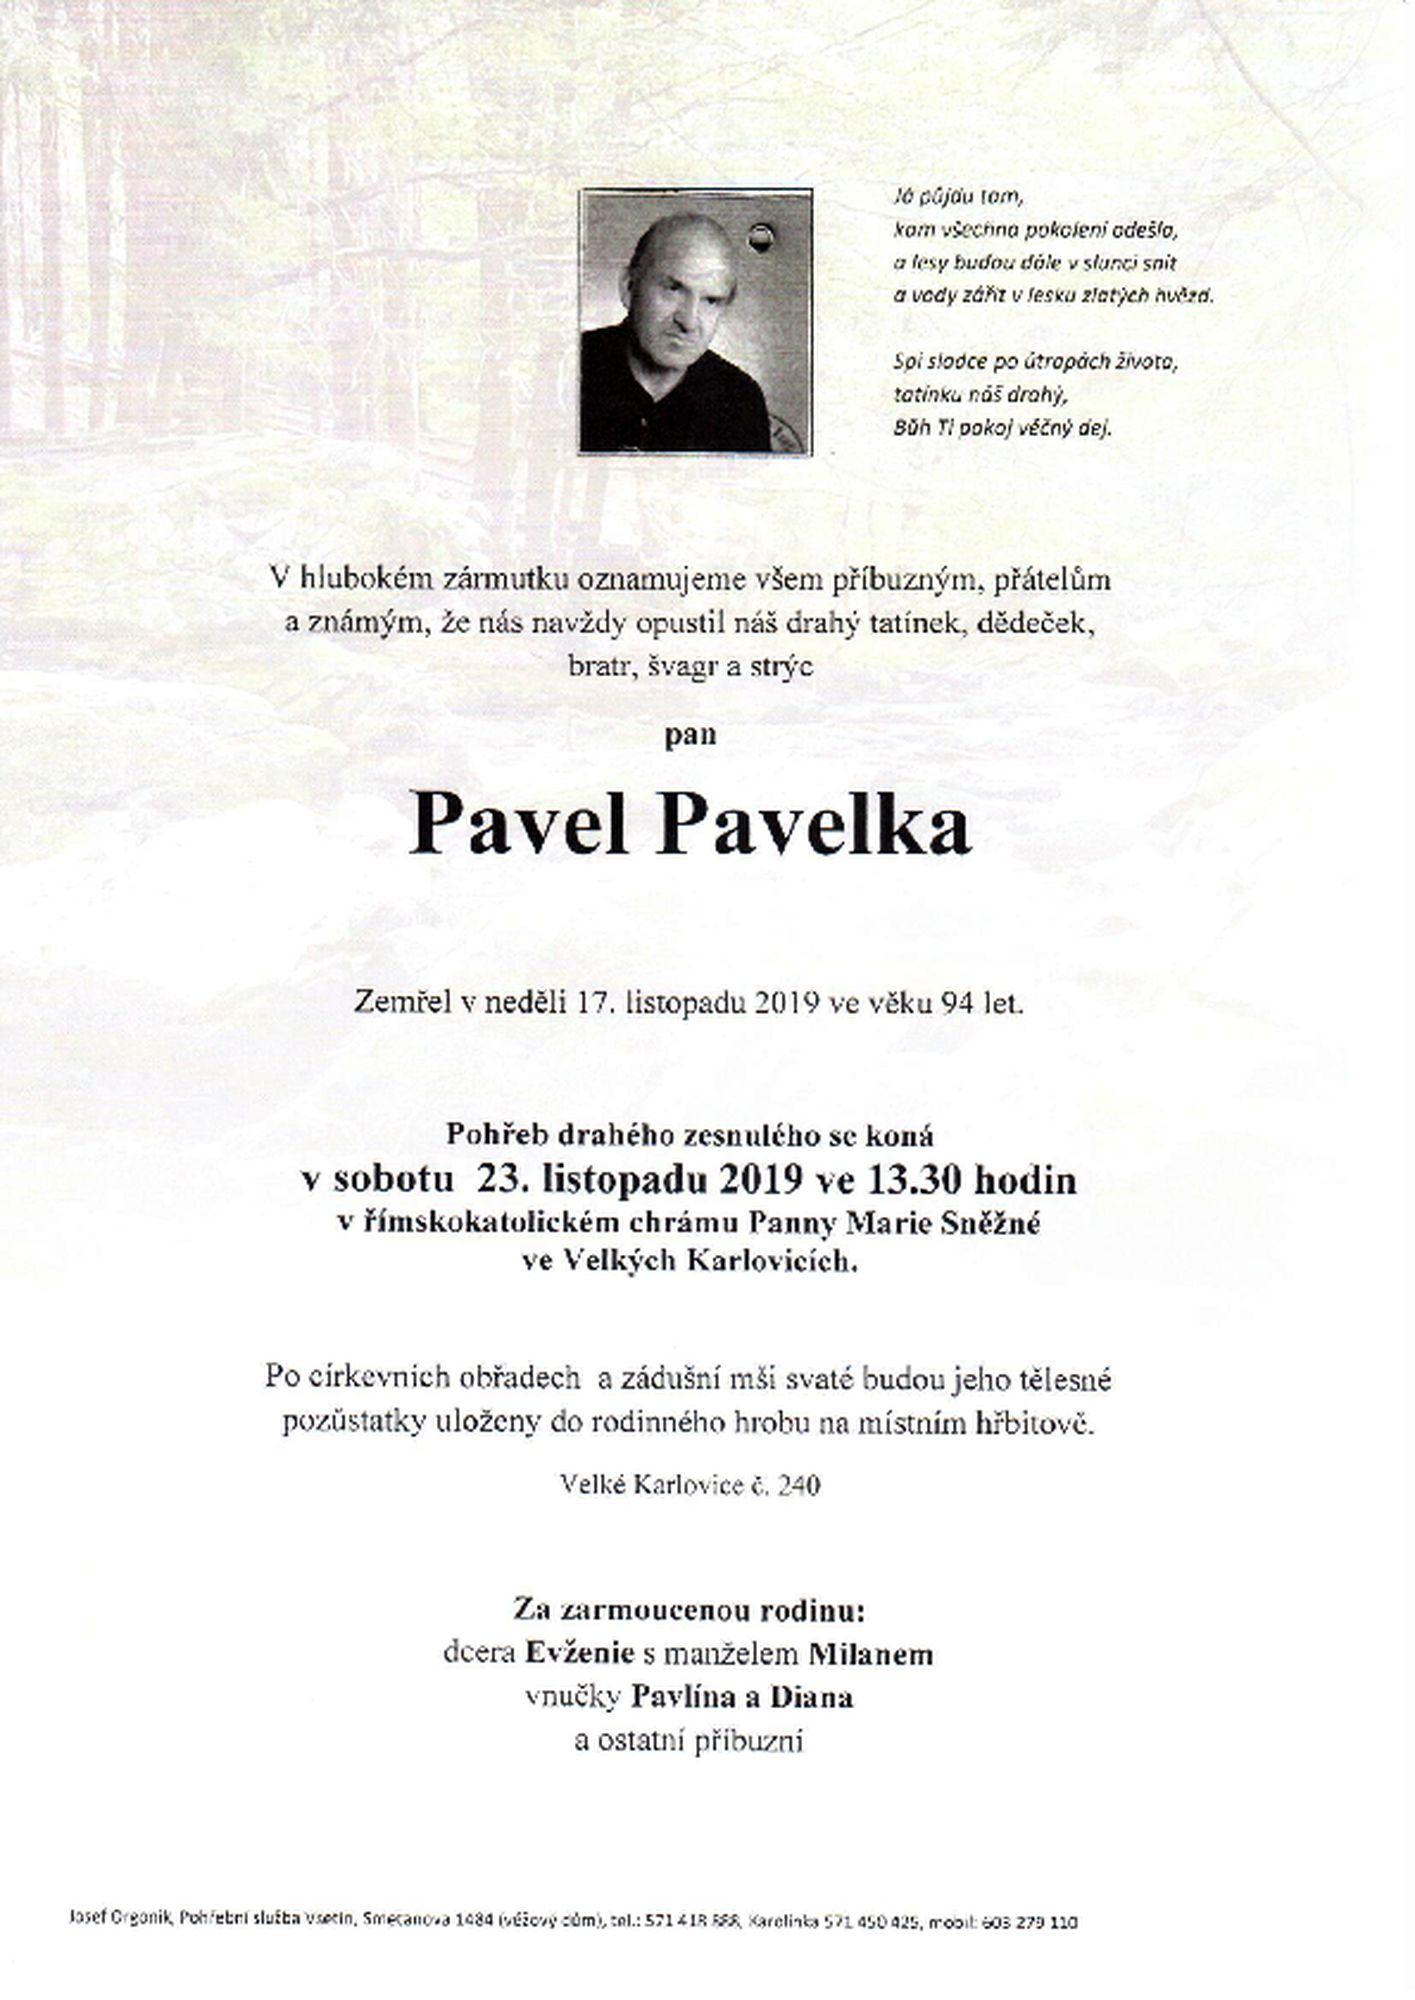 Pavel Pavelka